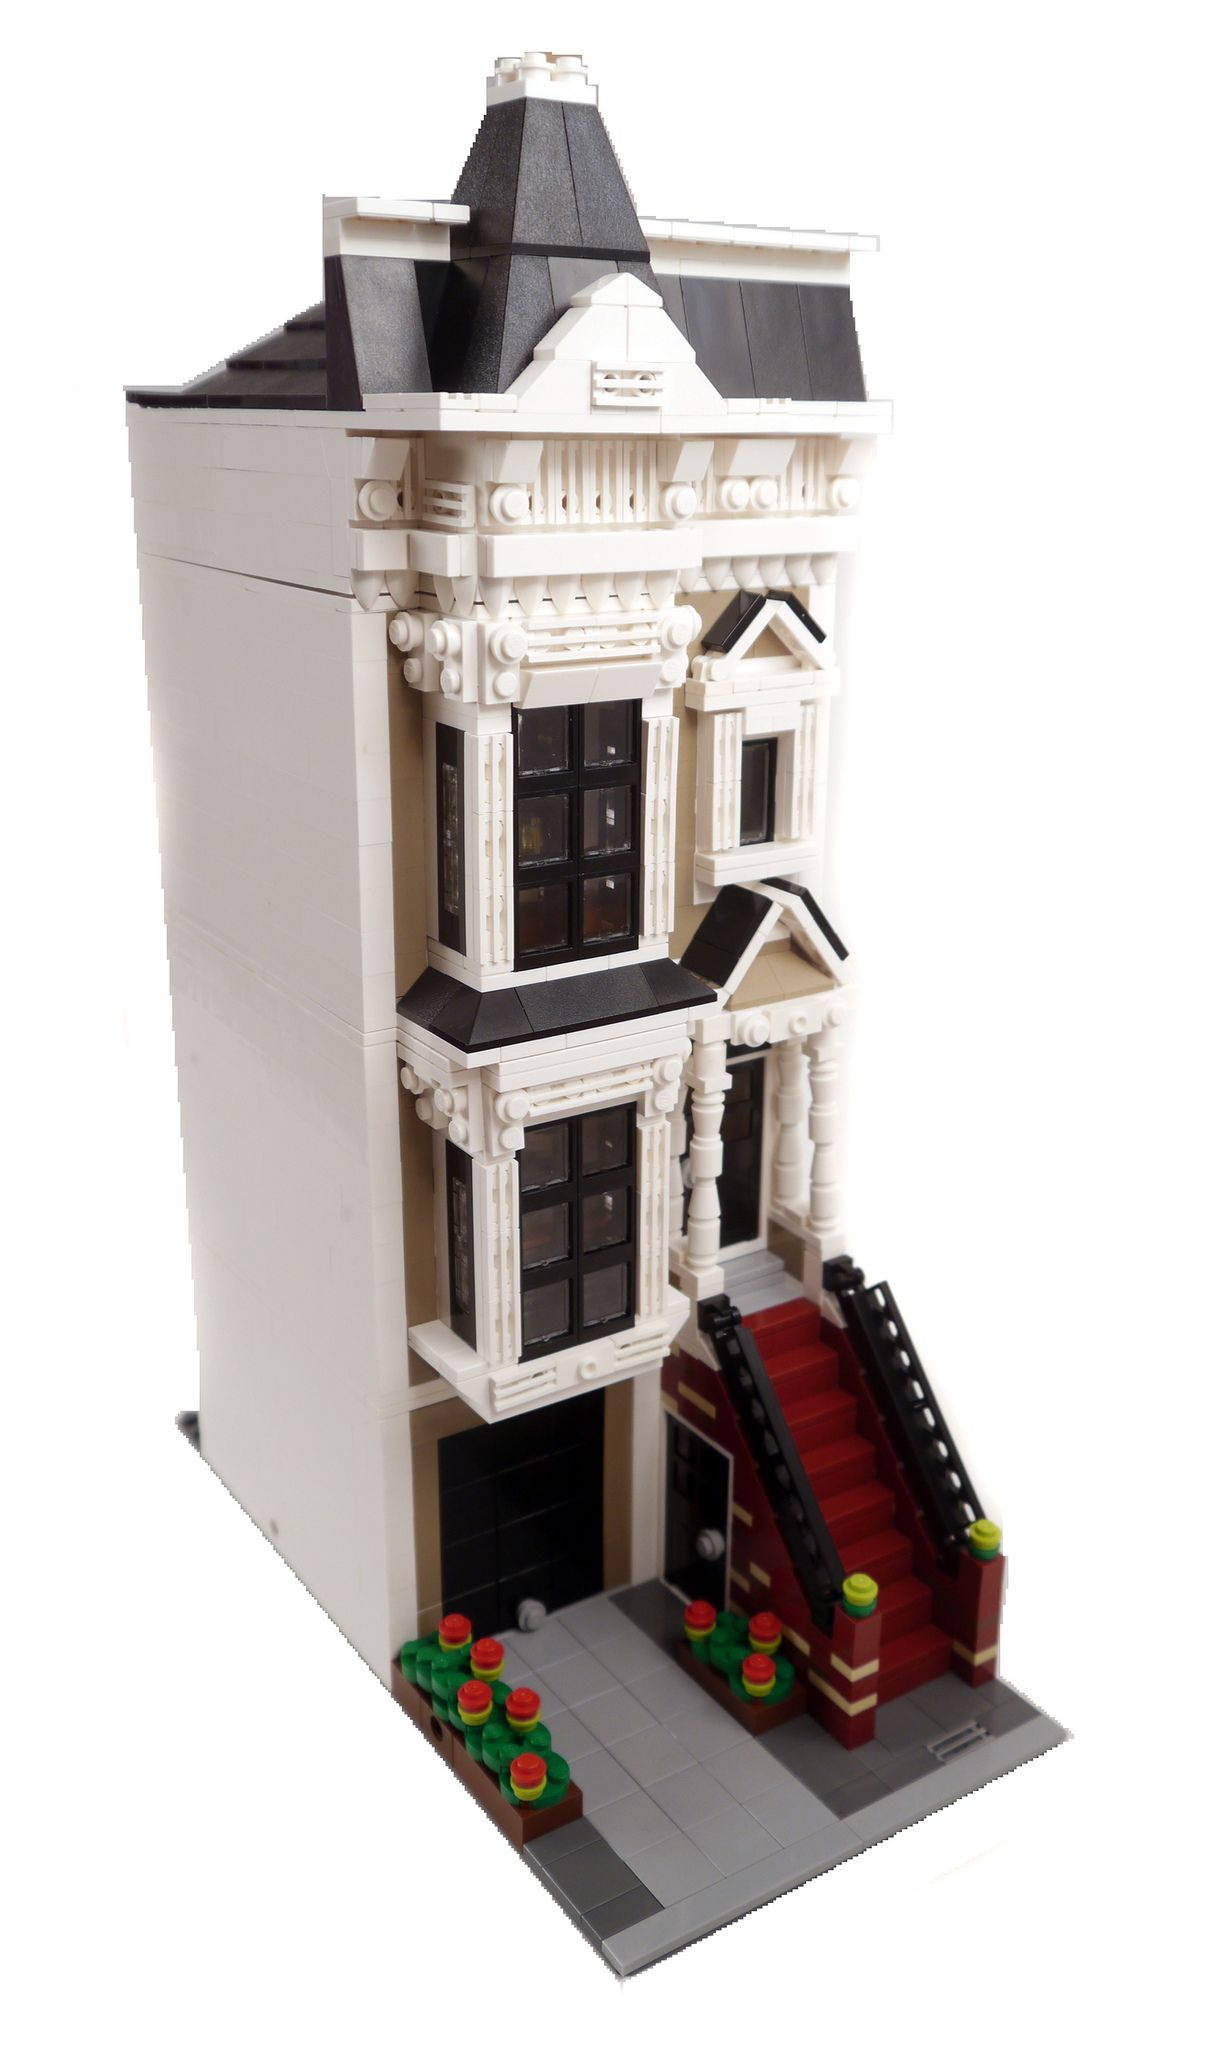 Lego Architecture Buildings Neighborhood